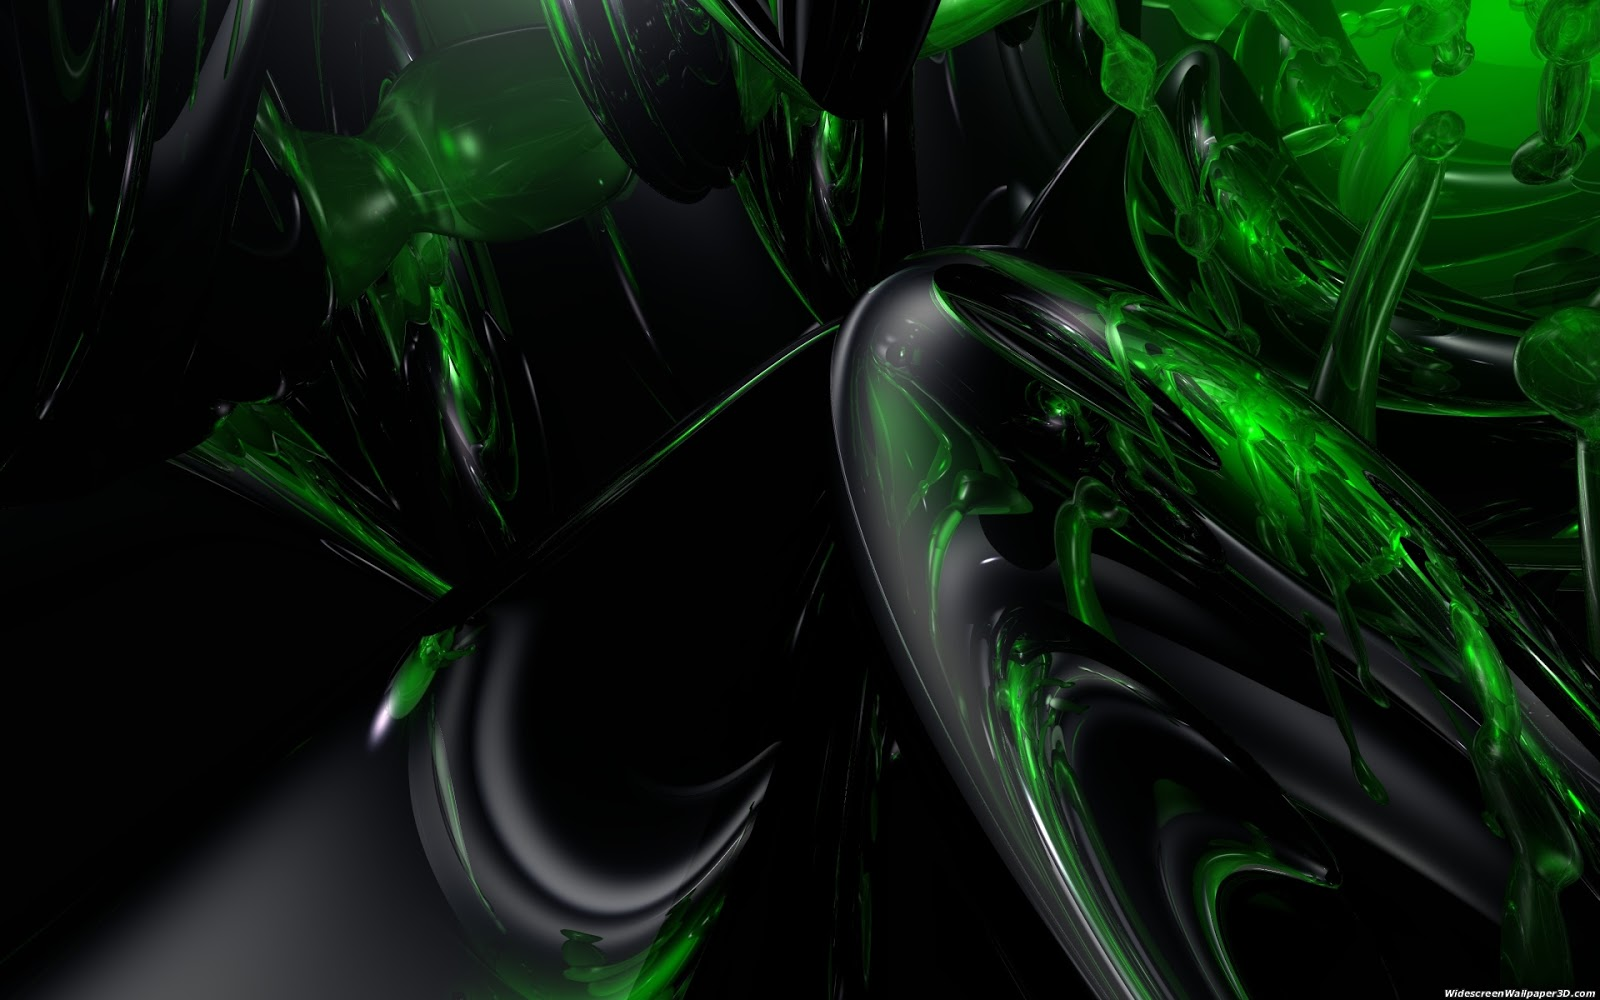 http://1.bp.blogspot.com/-nYHfixp8ssw/UME4R2g2I5I/AAAAAAAAPaU/WJR9pY6sodU/s1600/green-widescreen-wallpaper-1920x1200-01.jpg